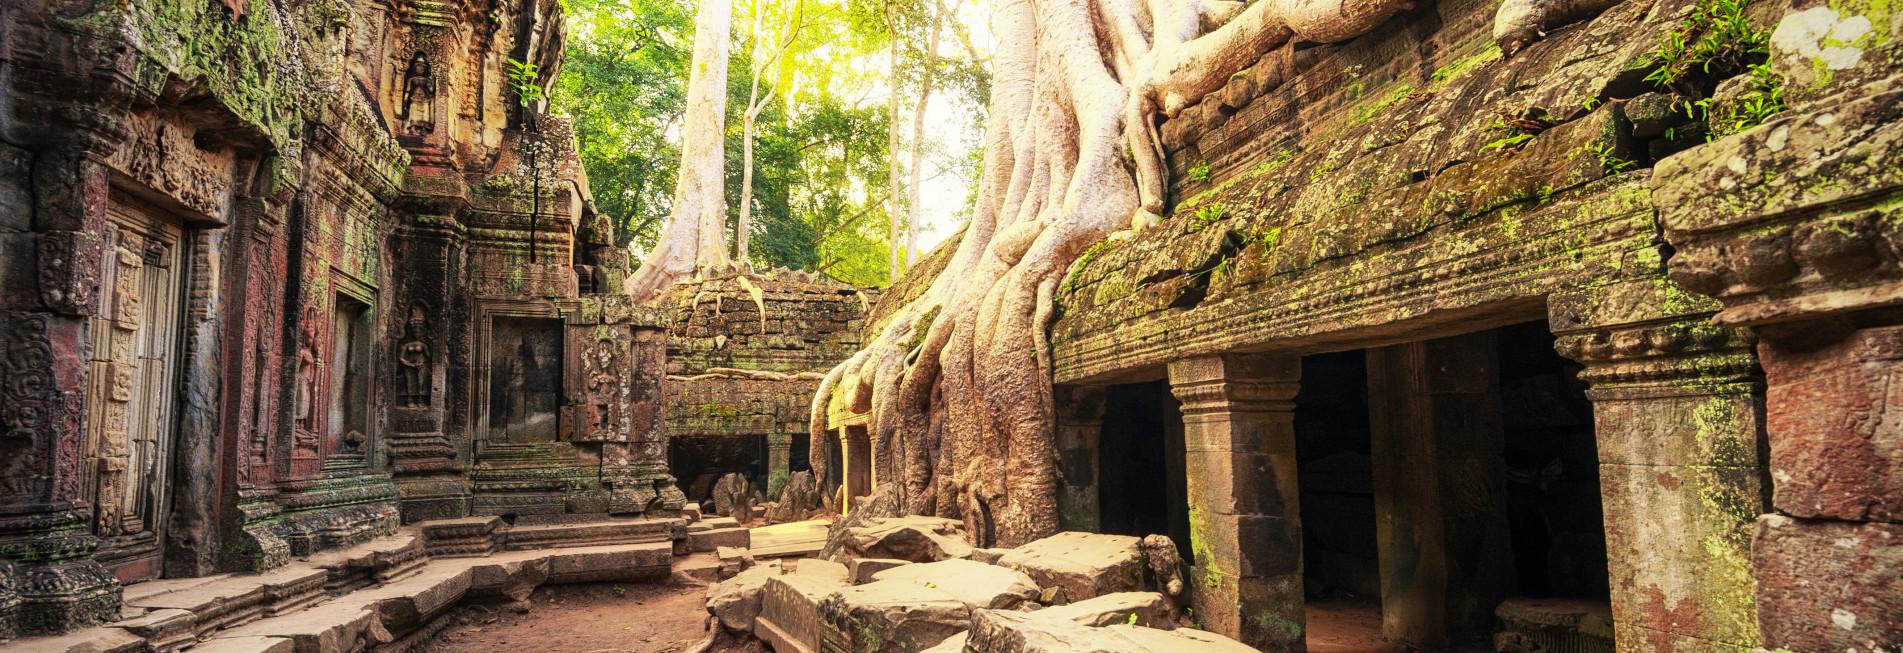 Khemer Tempel in Angkor Wat